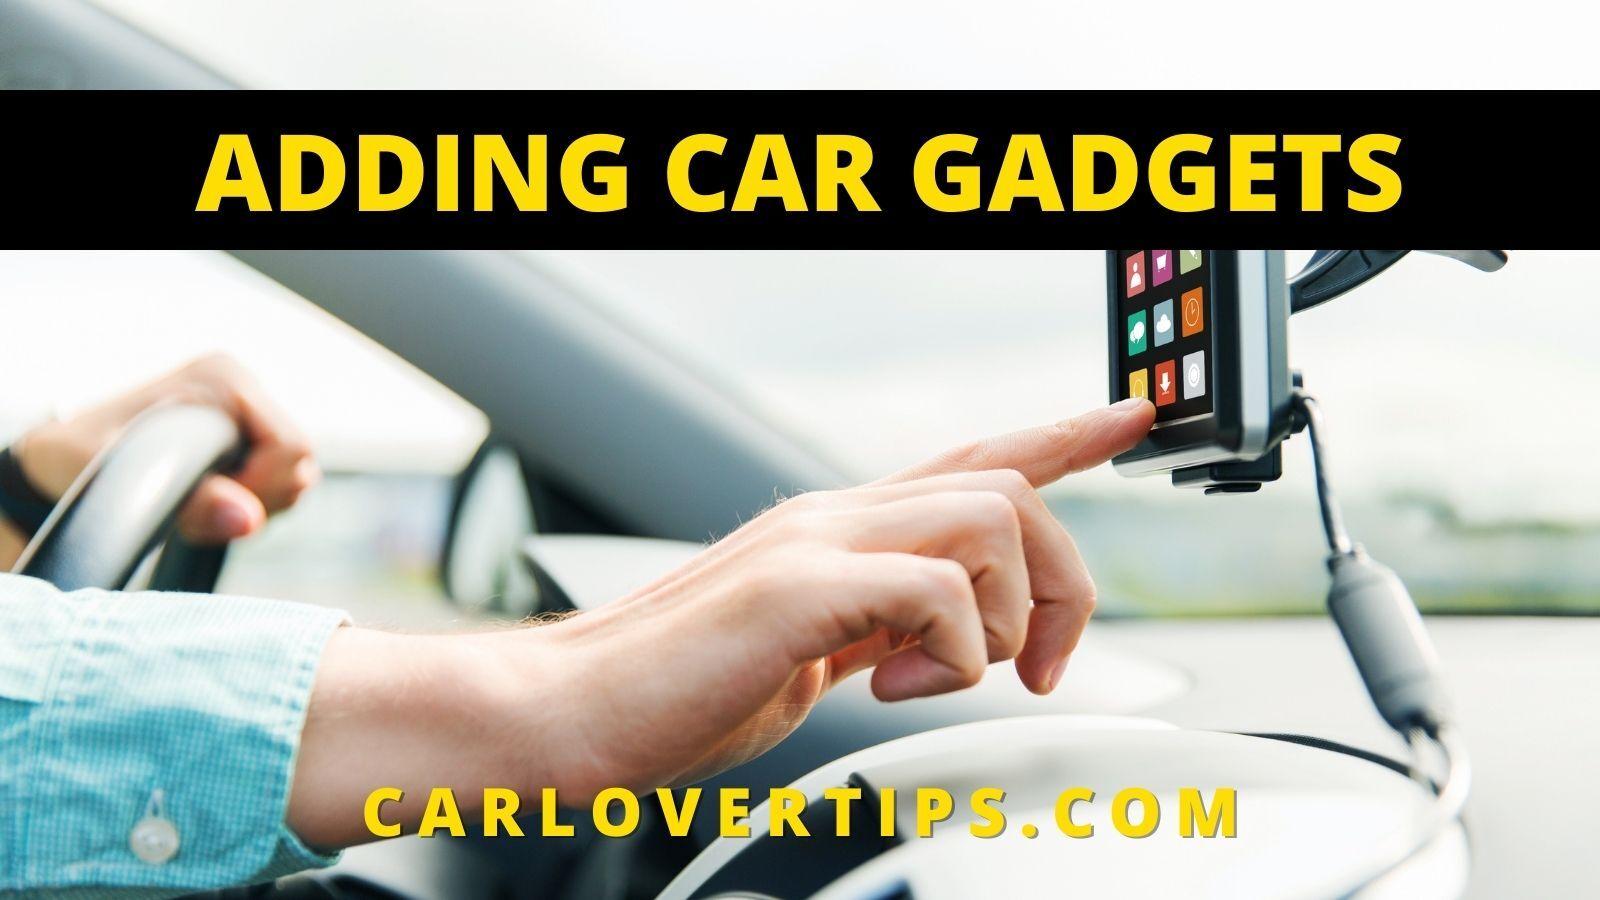 Adding Car Gadgets Tips Car Lover Tips